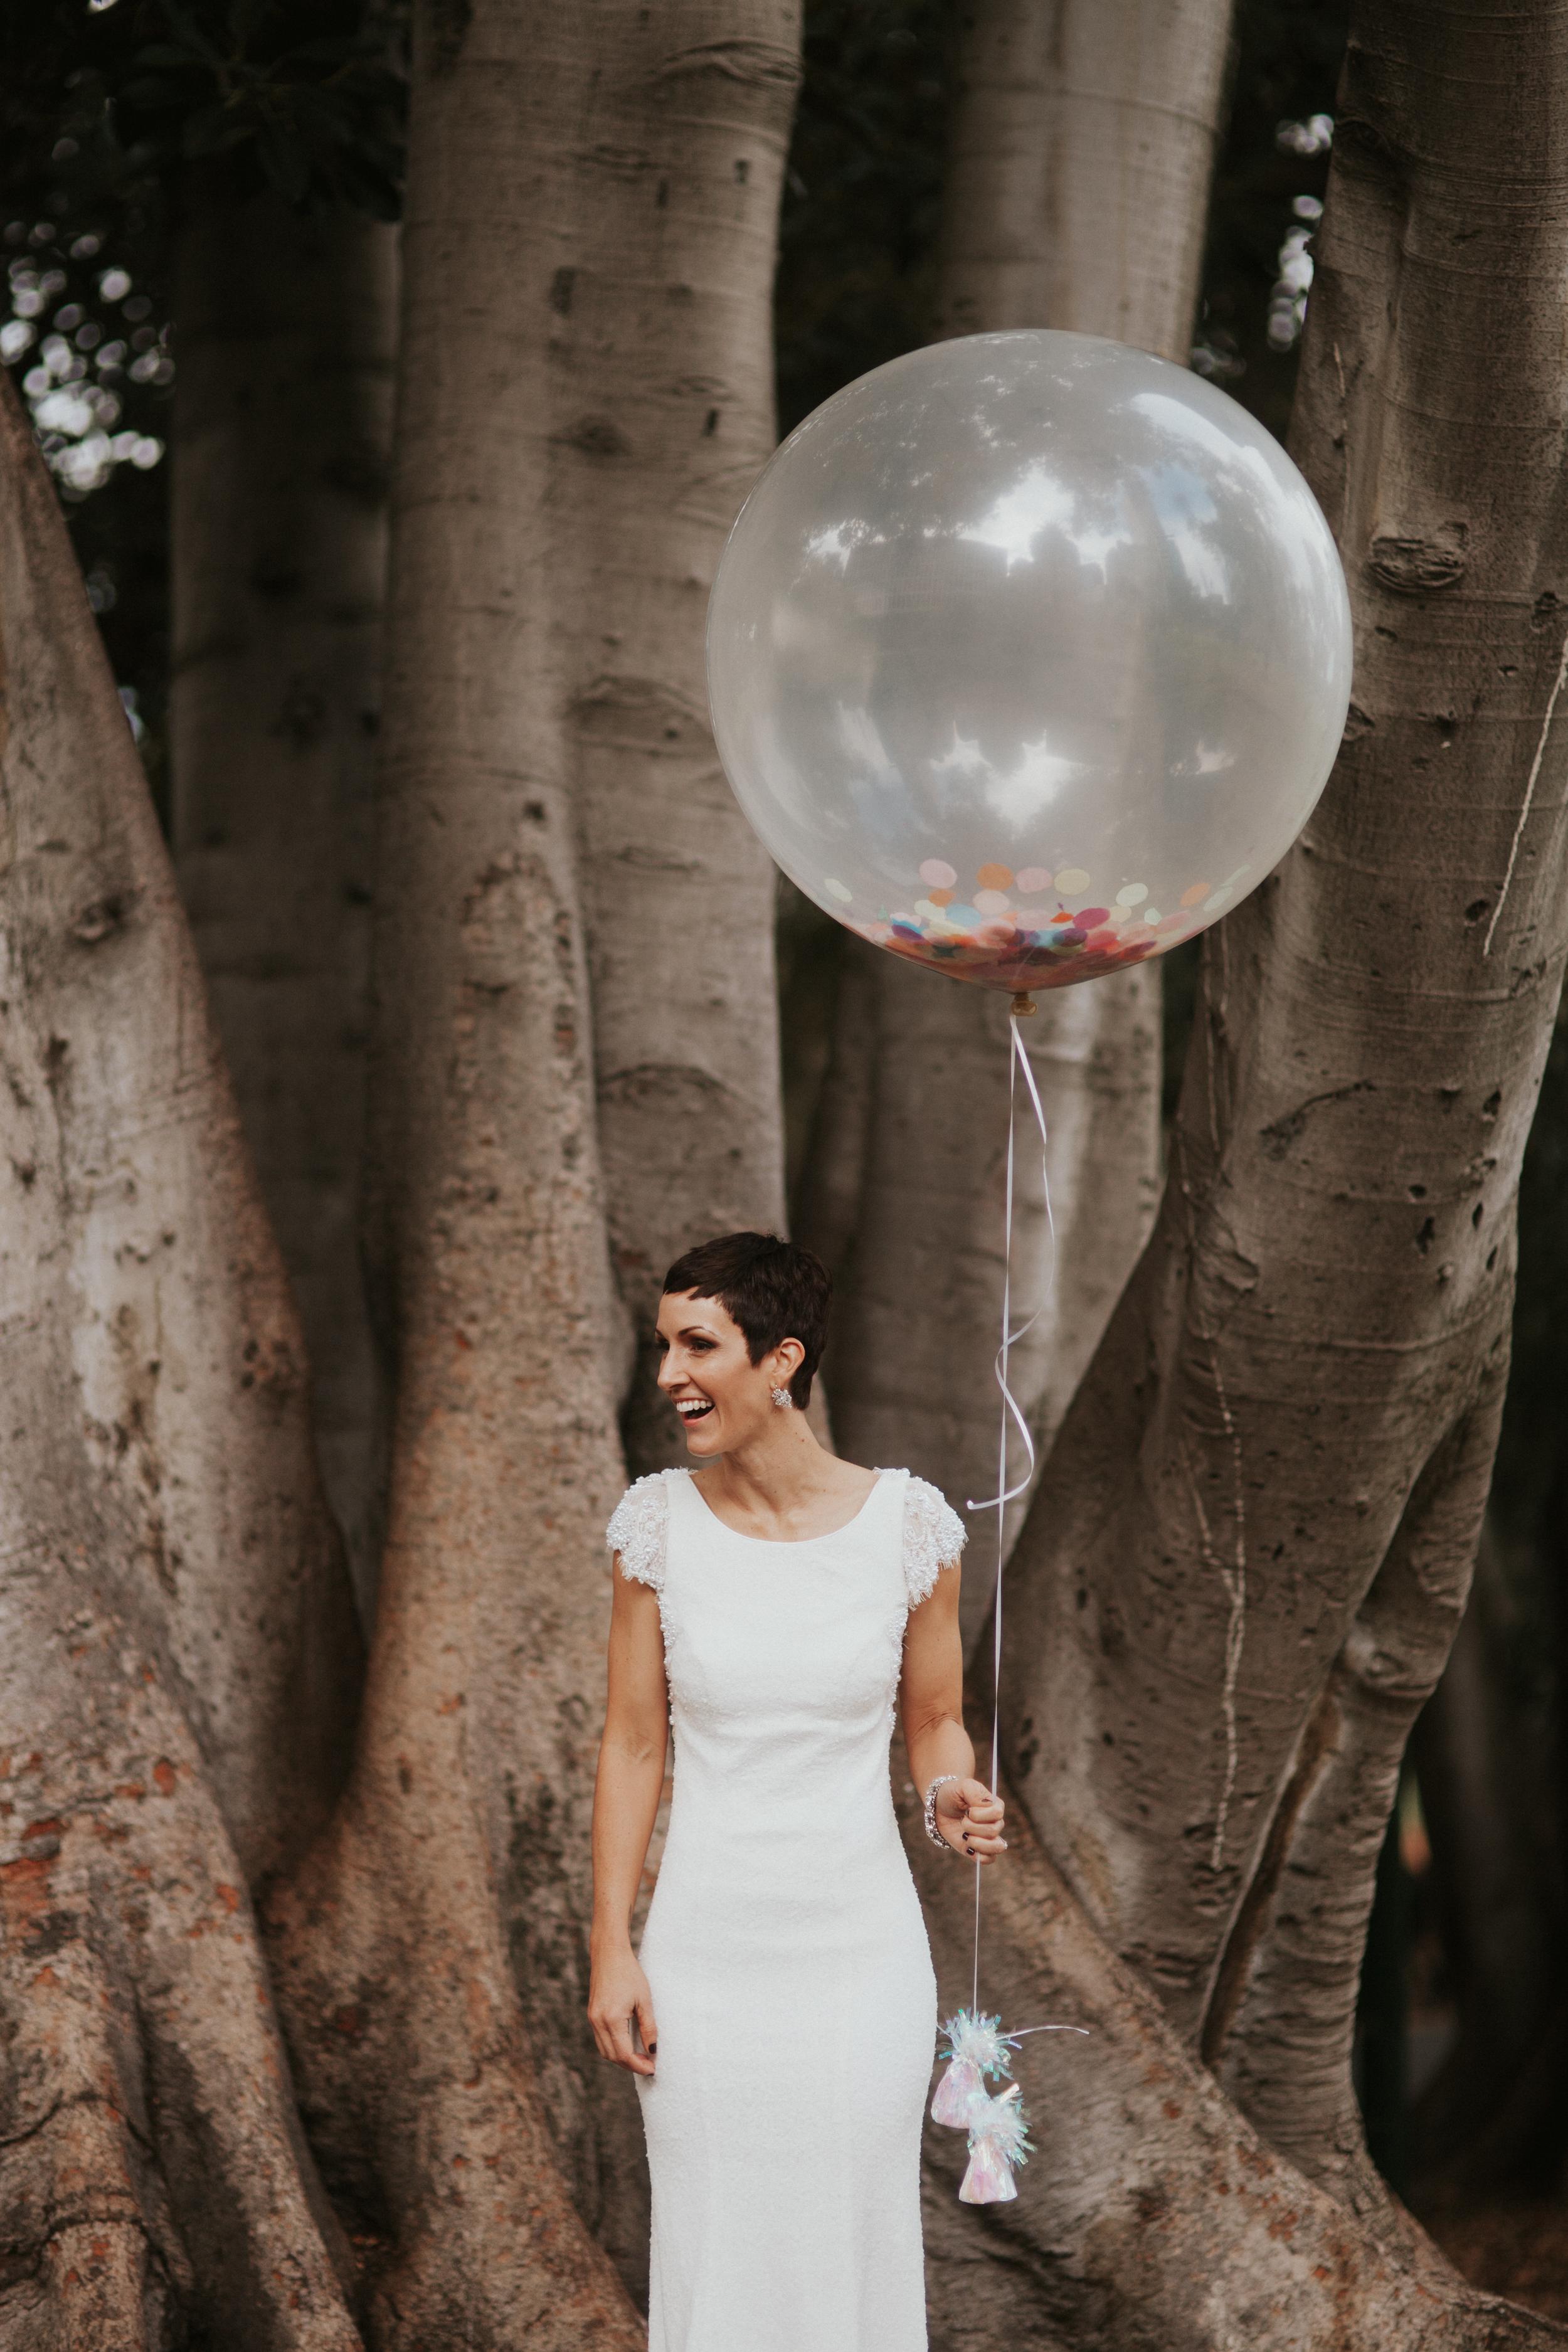 Melbourne-city-wedding-emotionsandmath-009.jpg